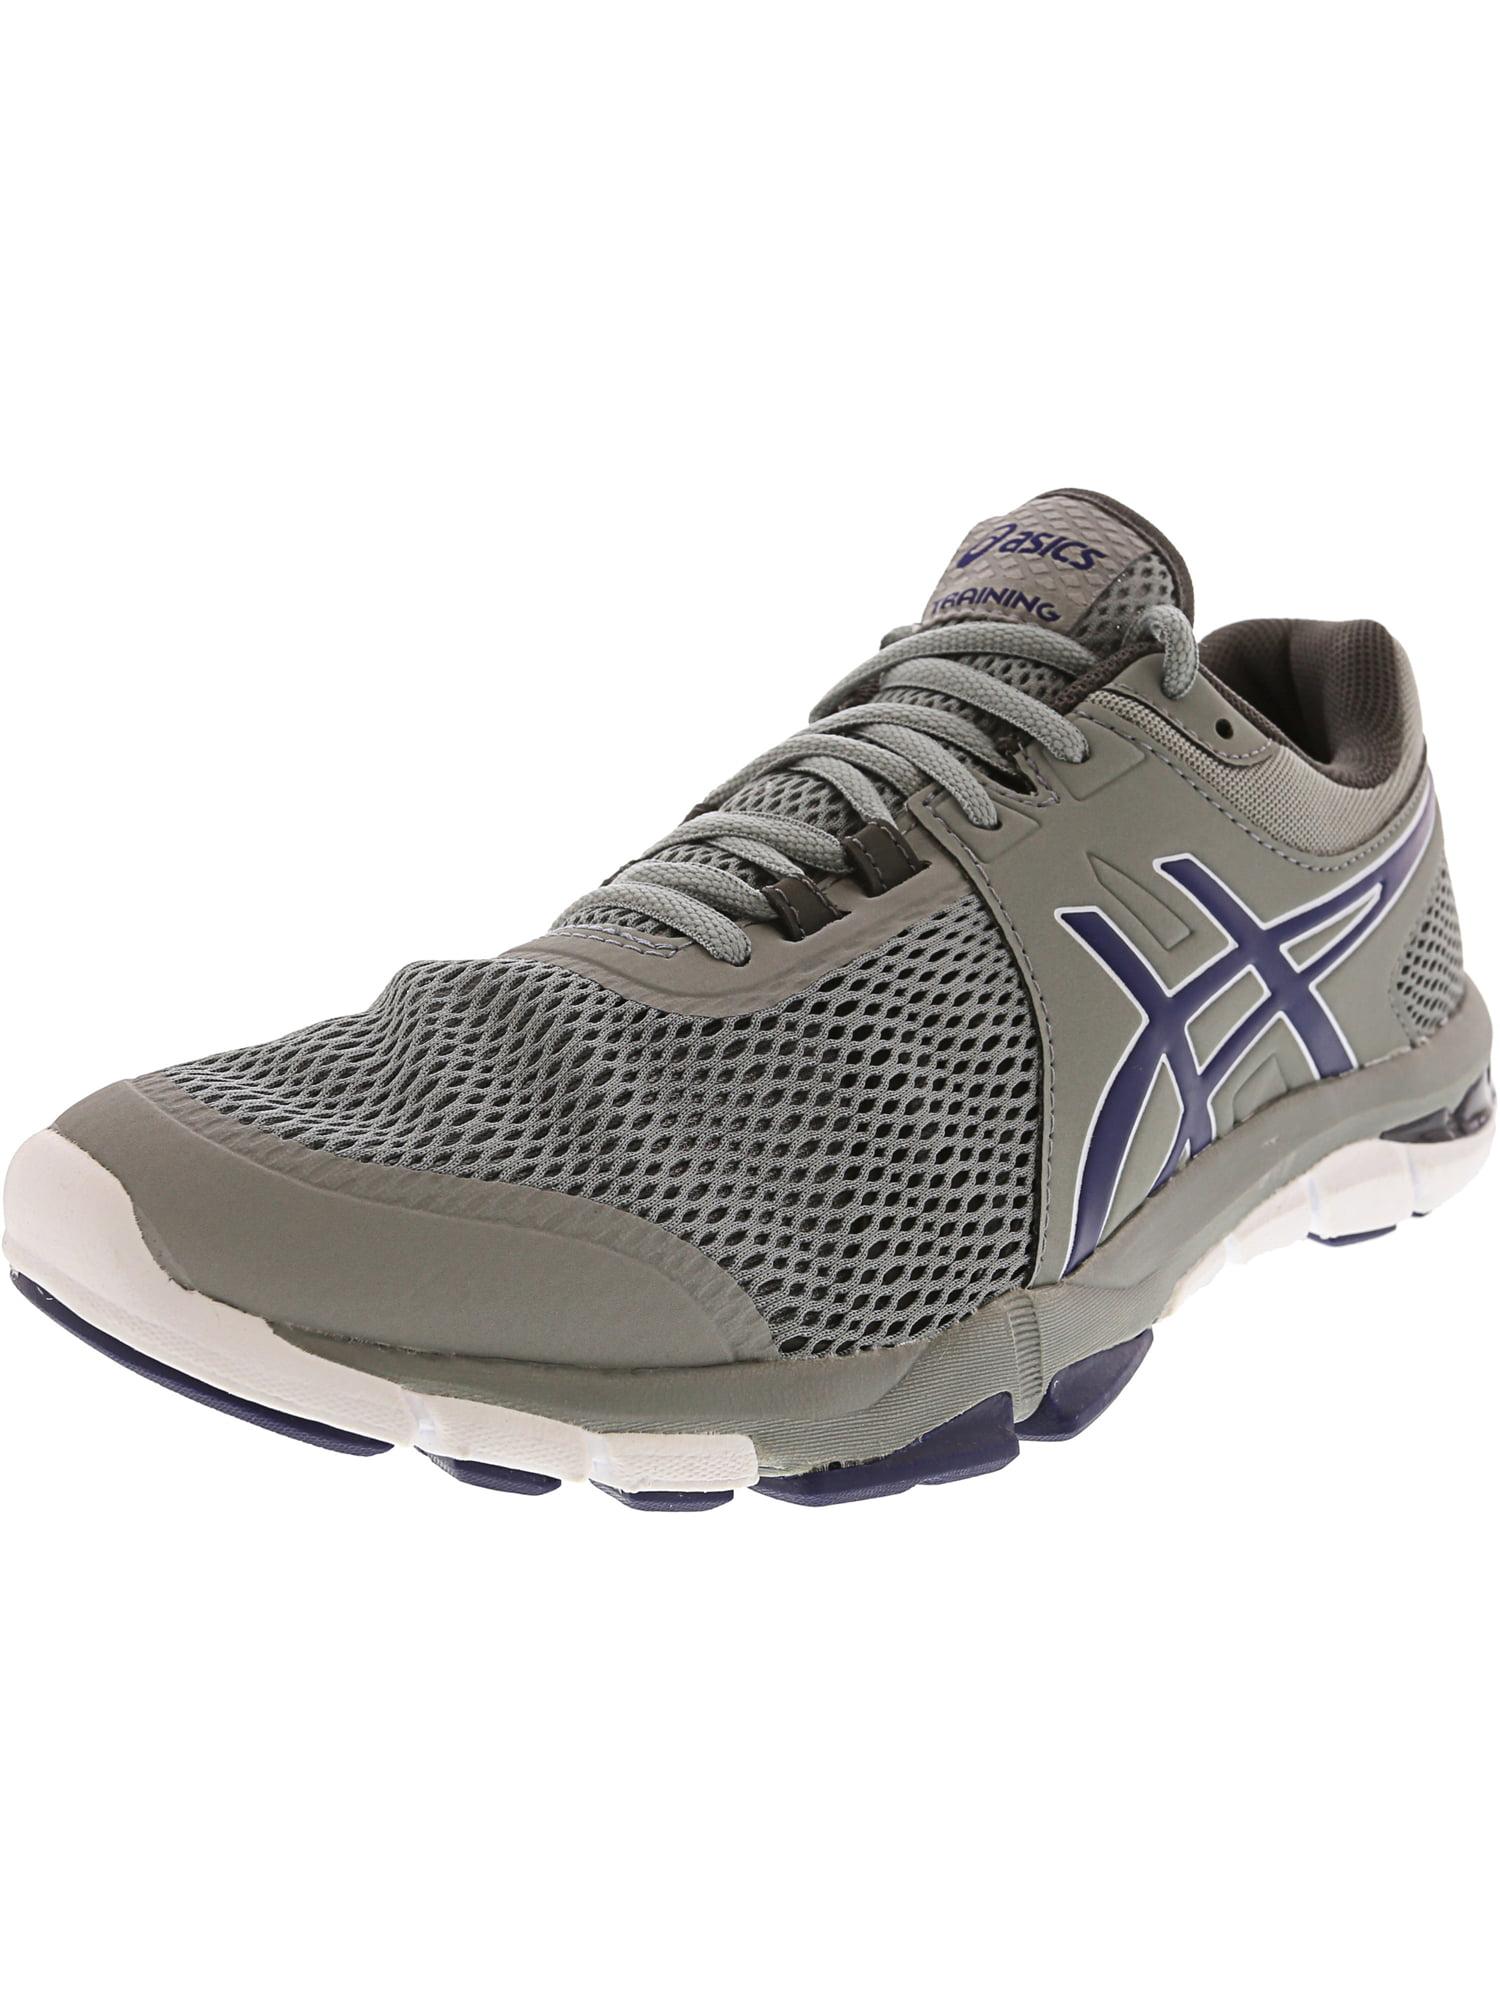 ASICS ASICS Gel Craze TR 4 Training Shoe 11.5M Stone Grey Blue Print